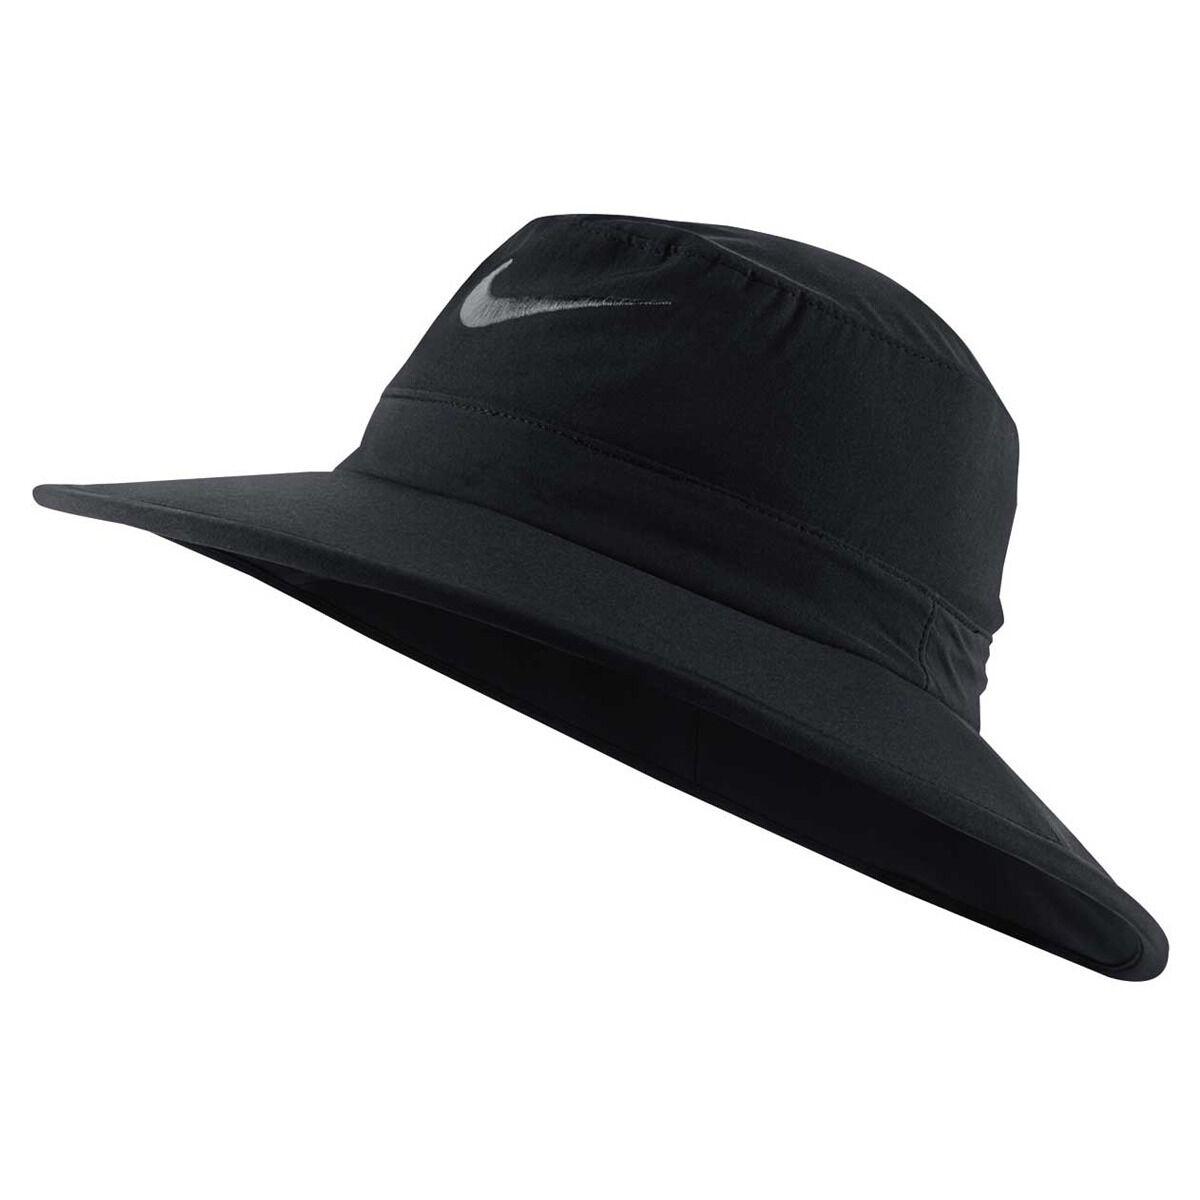 5a39a901c38 ... nike sun tech bucket hat black l xl adult black rebelhi res